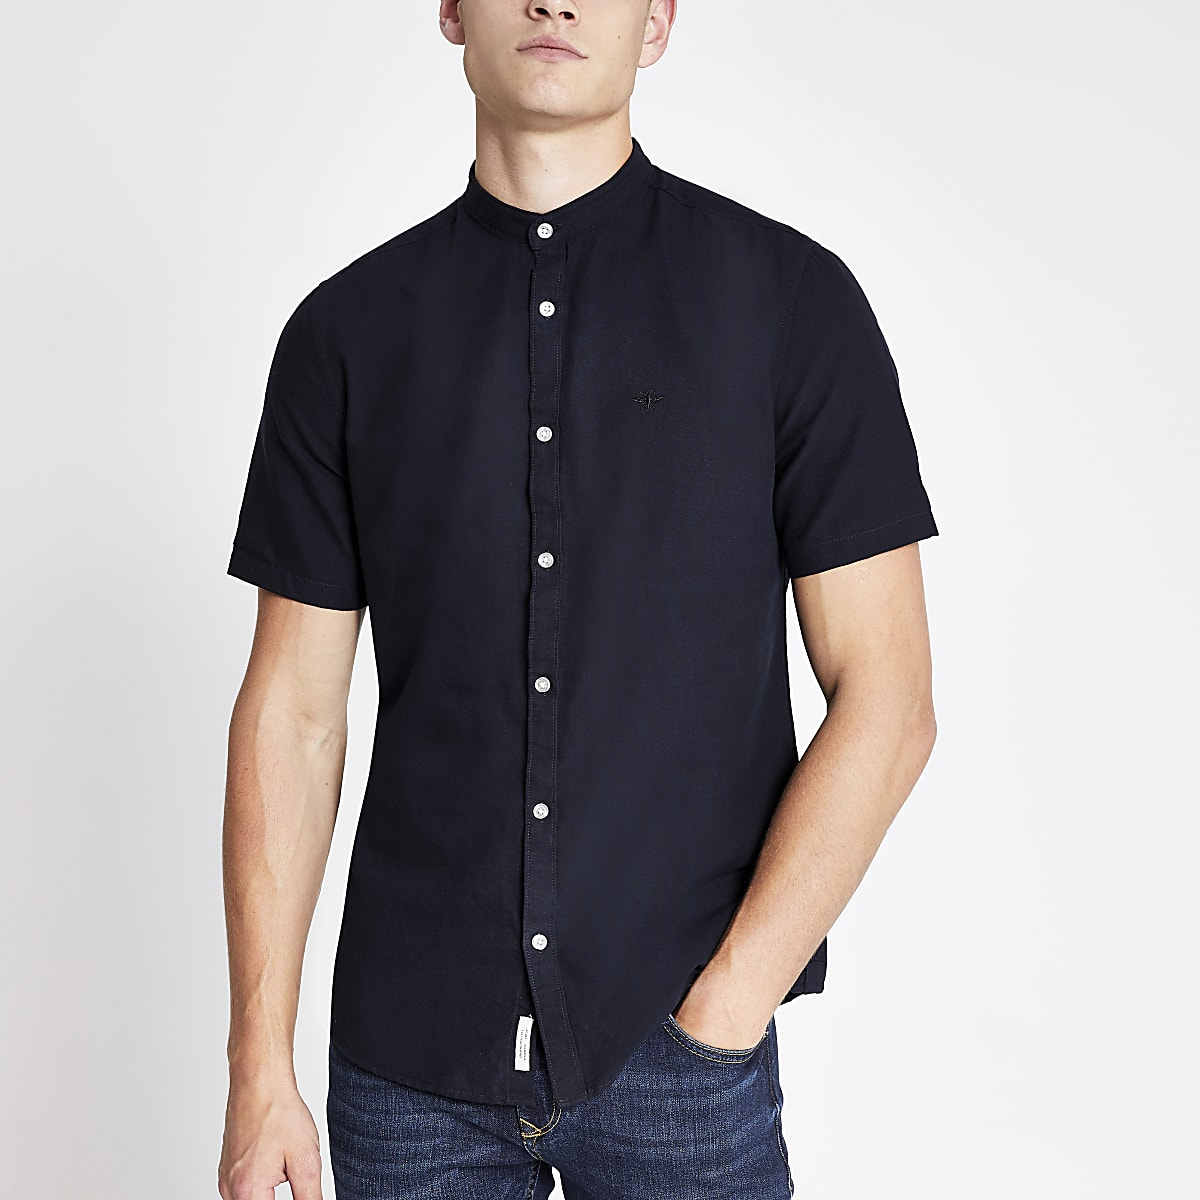 Navy wasp embroidered grandad Oxford shirt